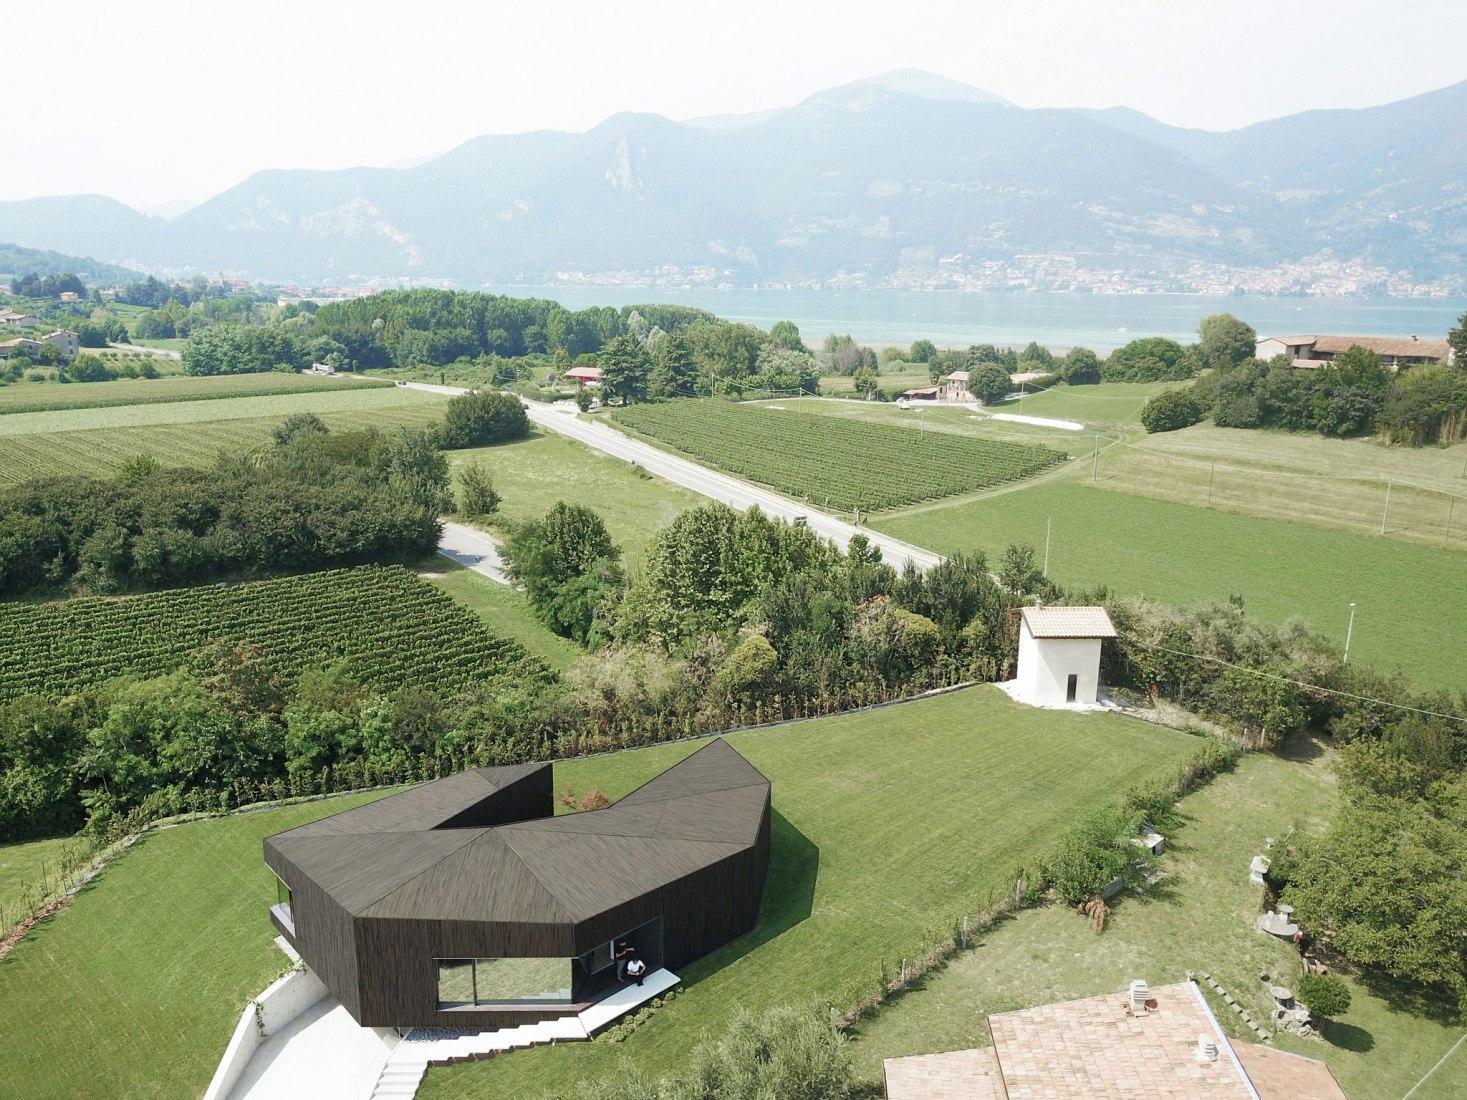 Claw House en Cremignane por Botticini + Facchinelli ARW. Fotografía por atelier XYZ.